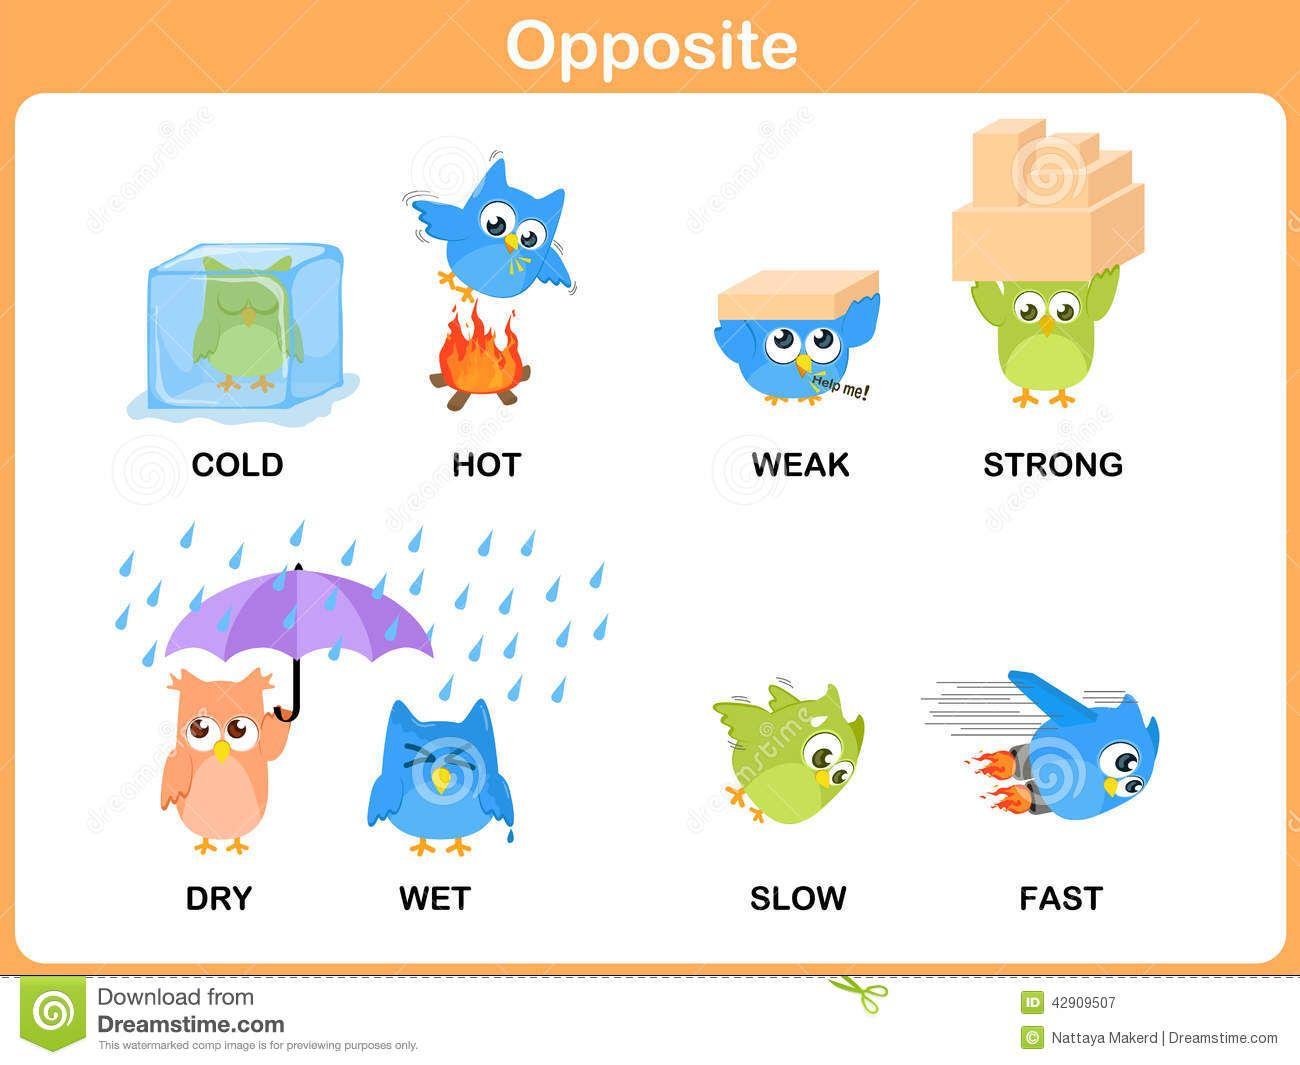 Opposite Words Opposite Words For Kids Preschool Themes [ 1065 x 1300 Pixel ]